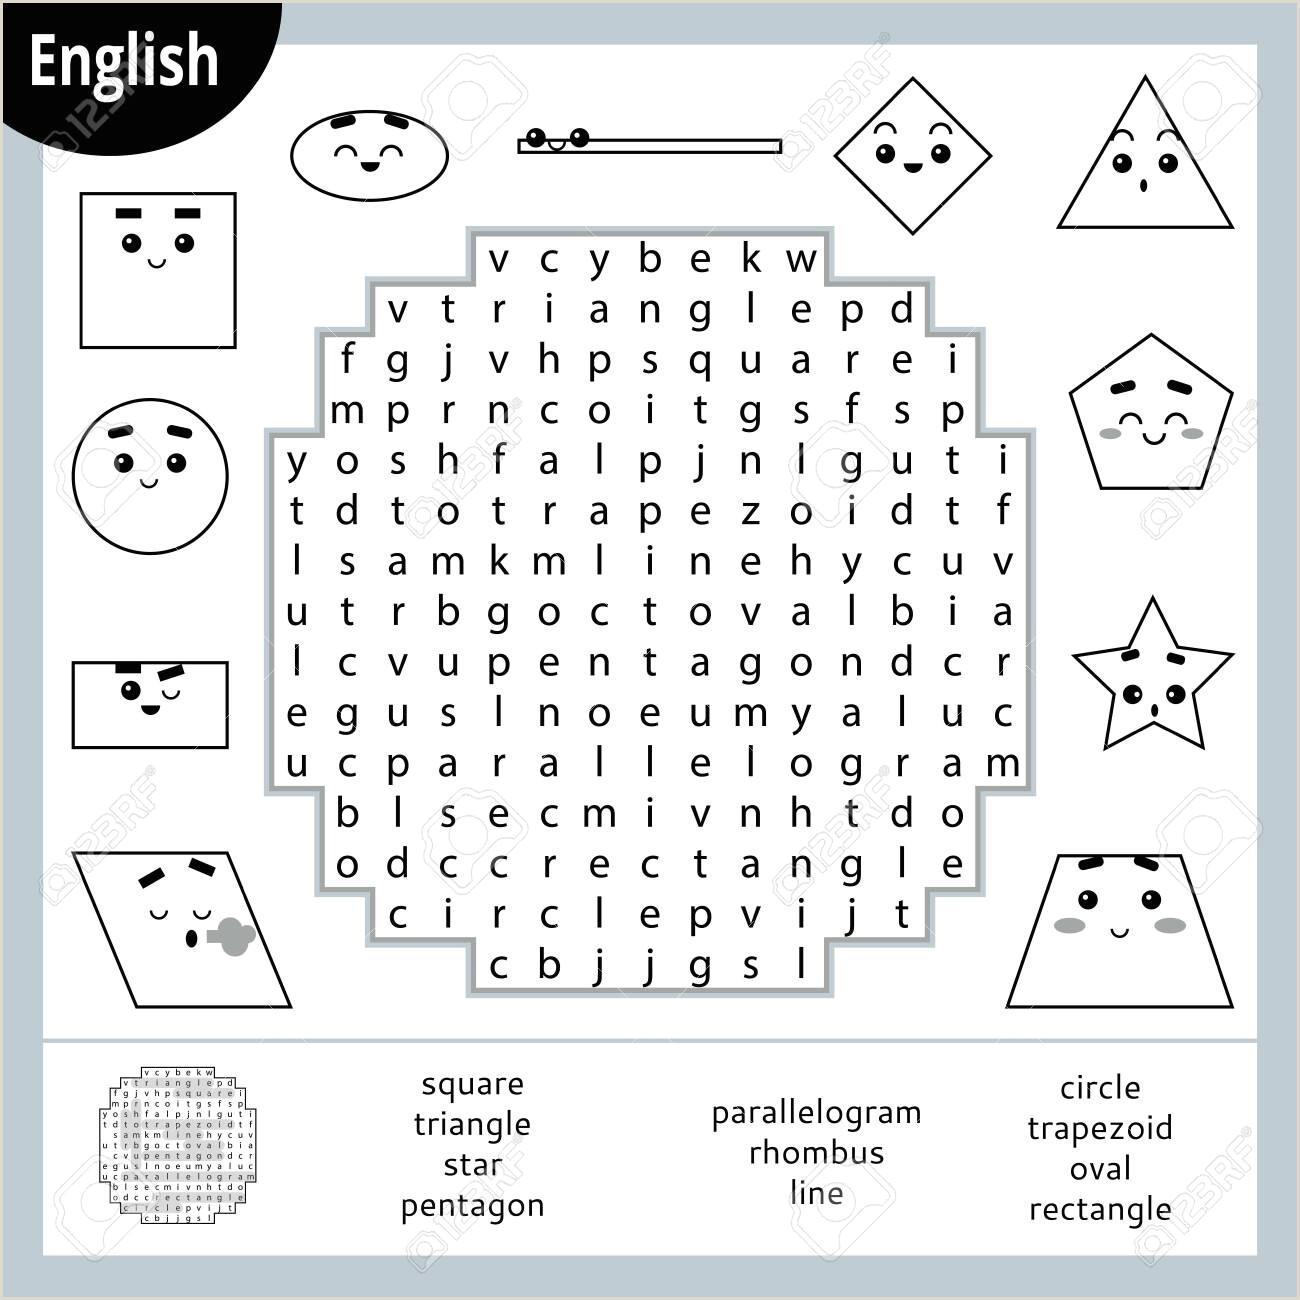 Free Printable English Worksheets For Kindergarten